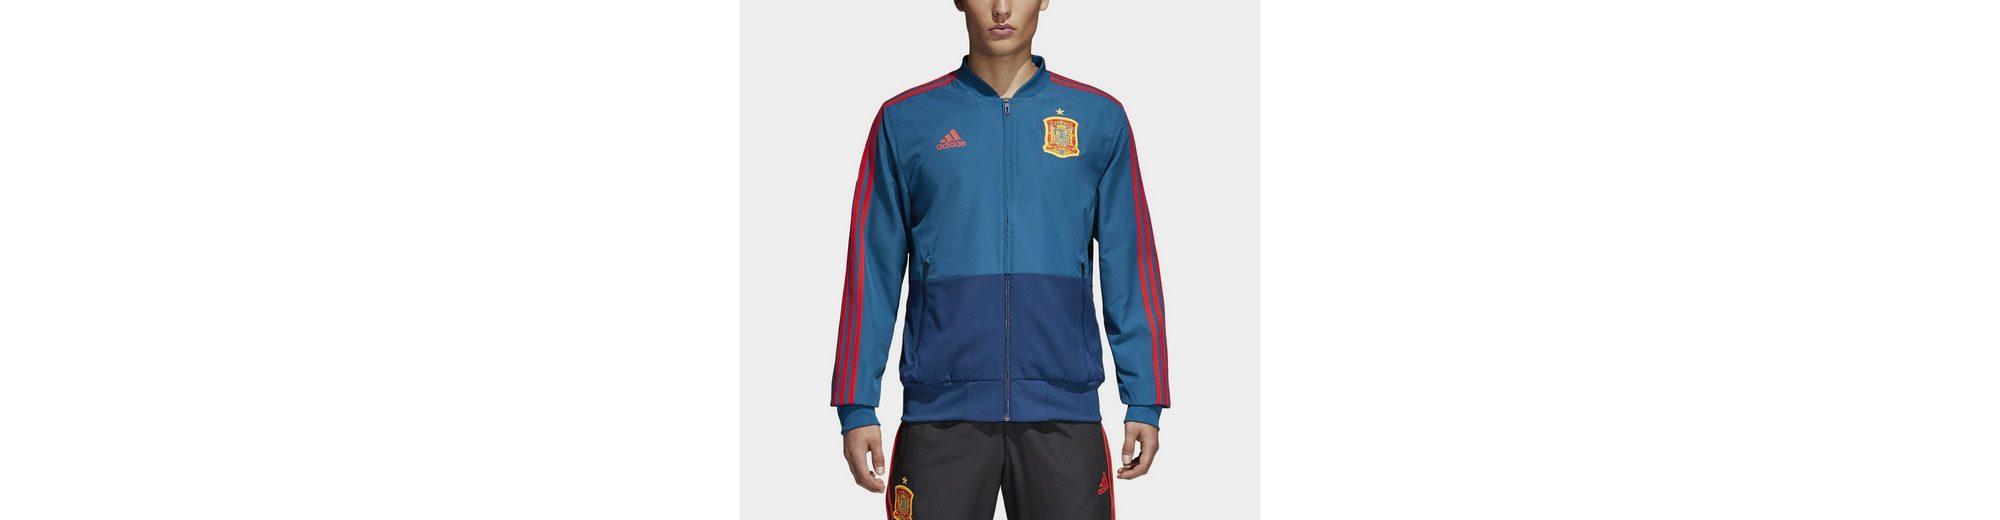 adidas Performance Funktions-Kapuzensweatjacke Spanien Jacke Auslass Perfekt Niedrige Versandgebühr Online Mode-Stil Günstig Online AZGRYb03U